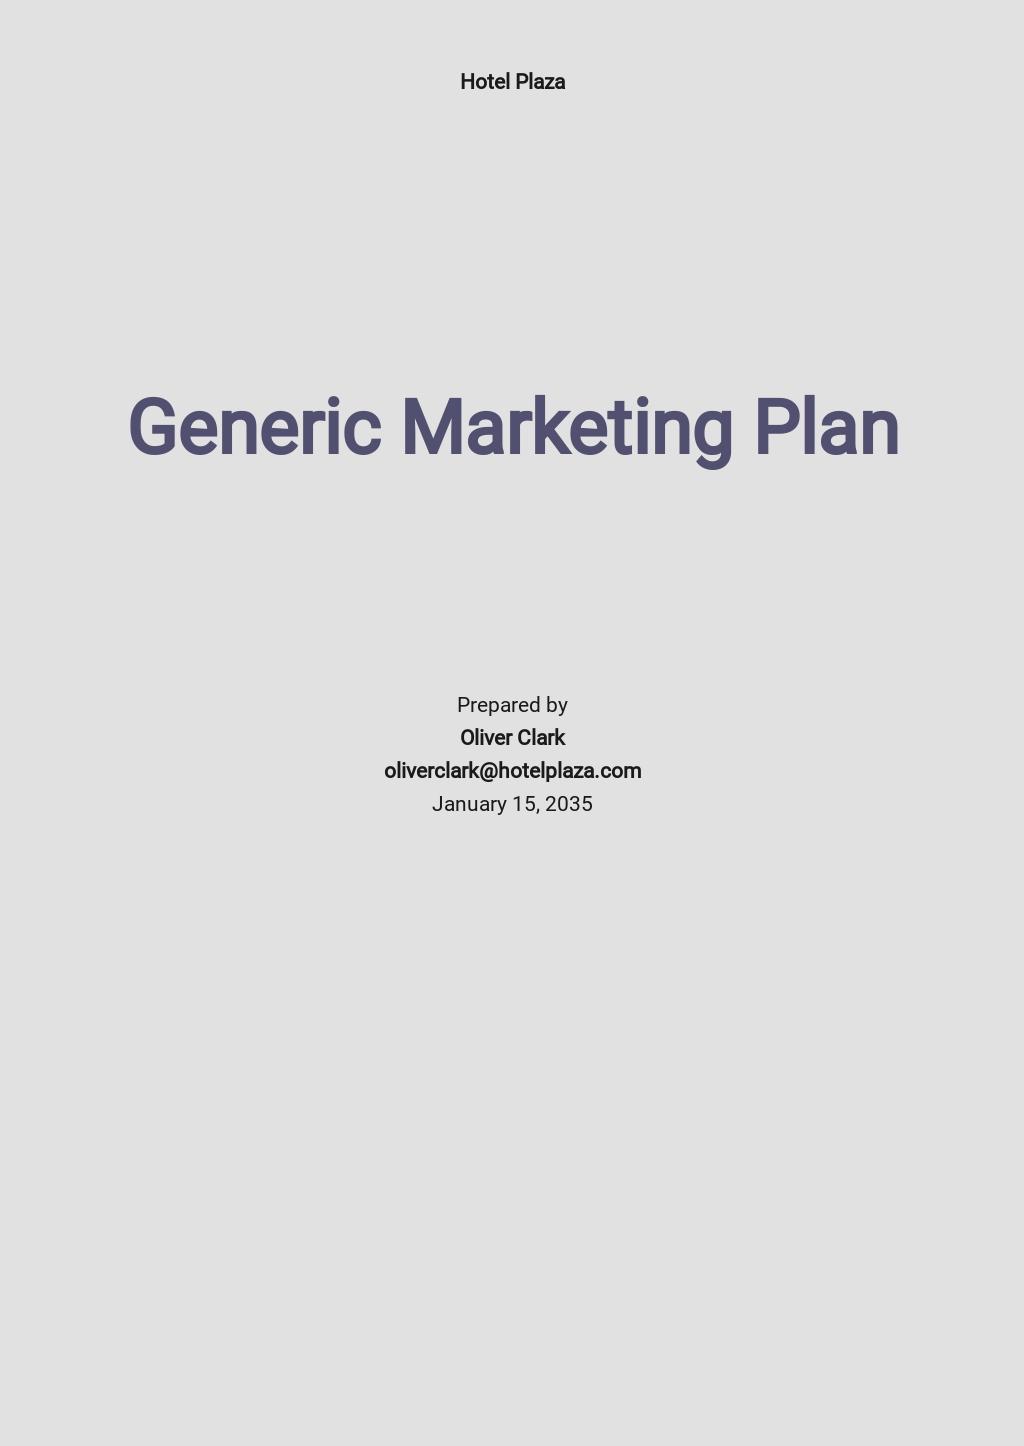 Generic Marketing Plan Template